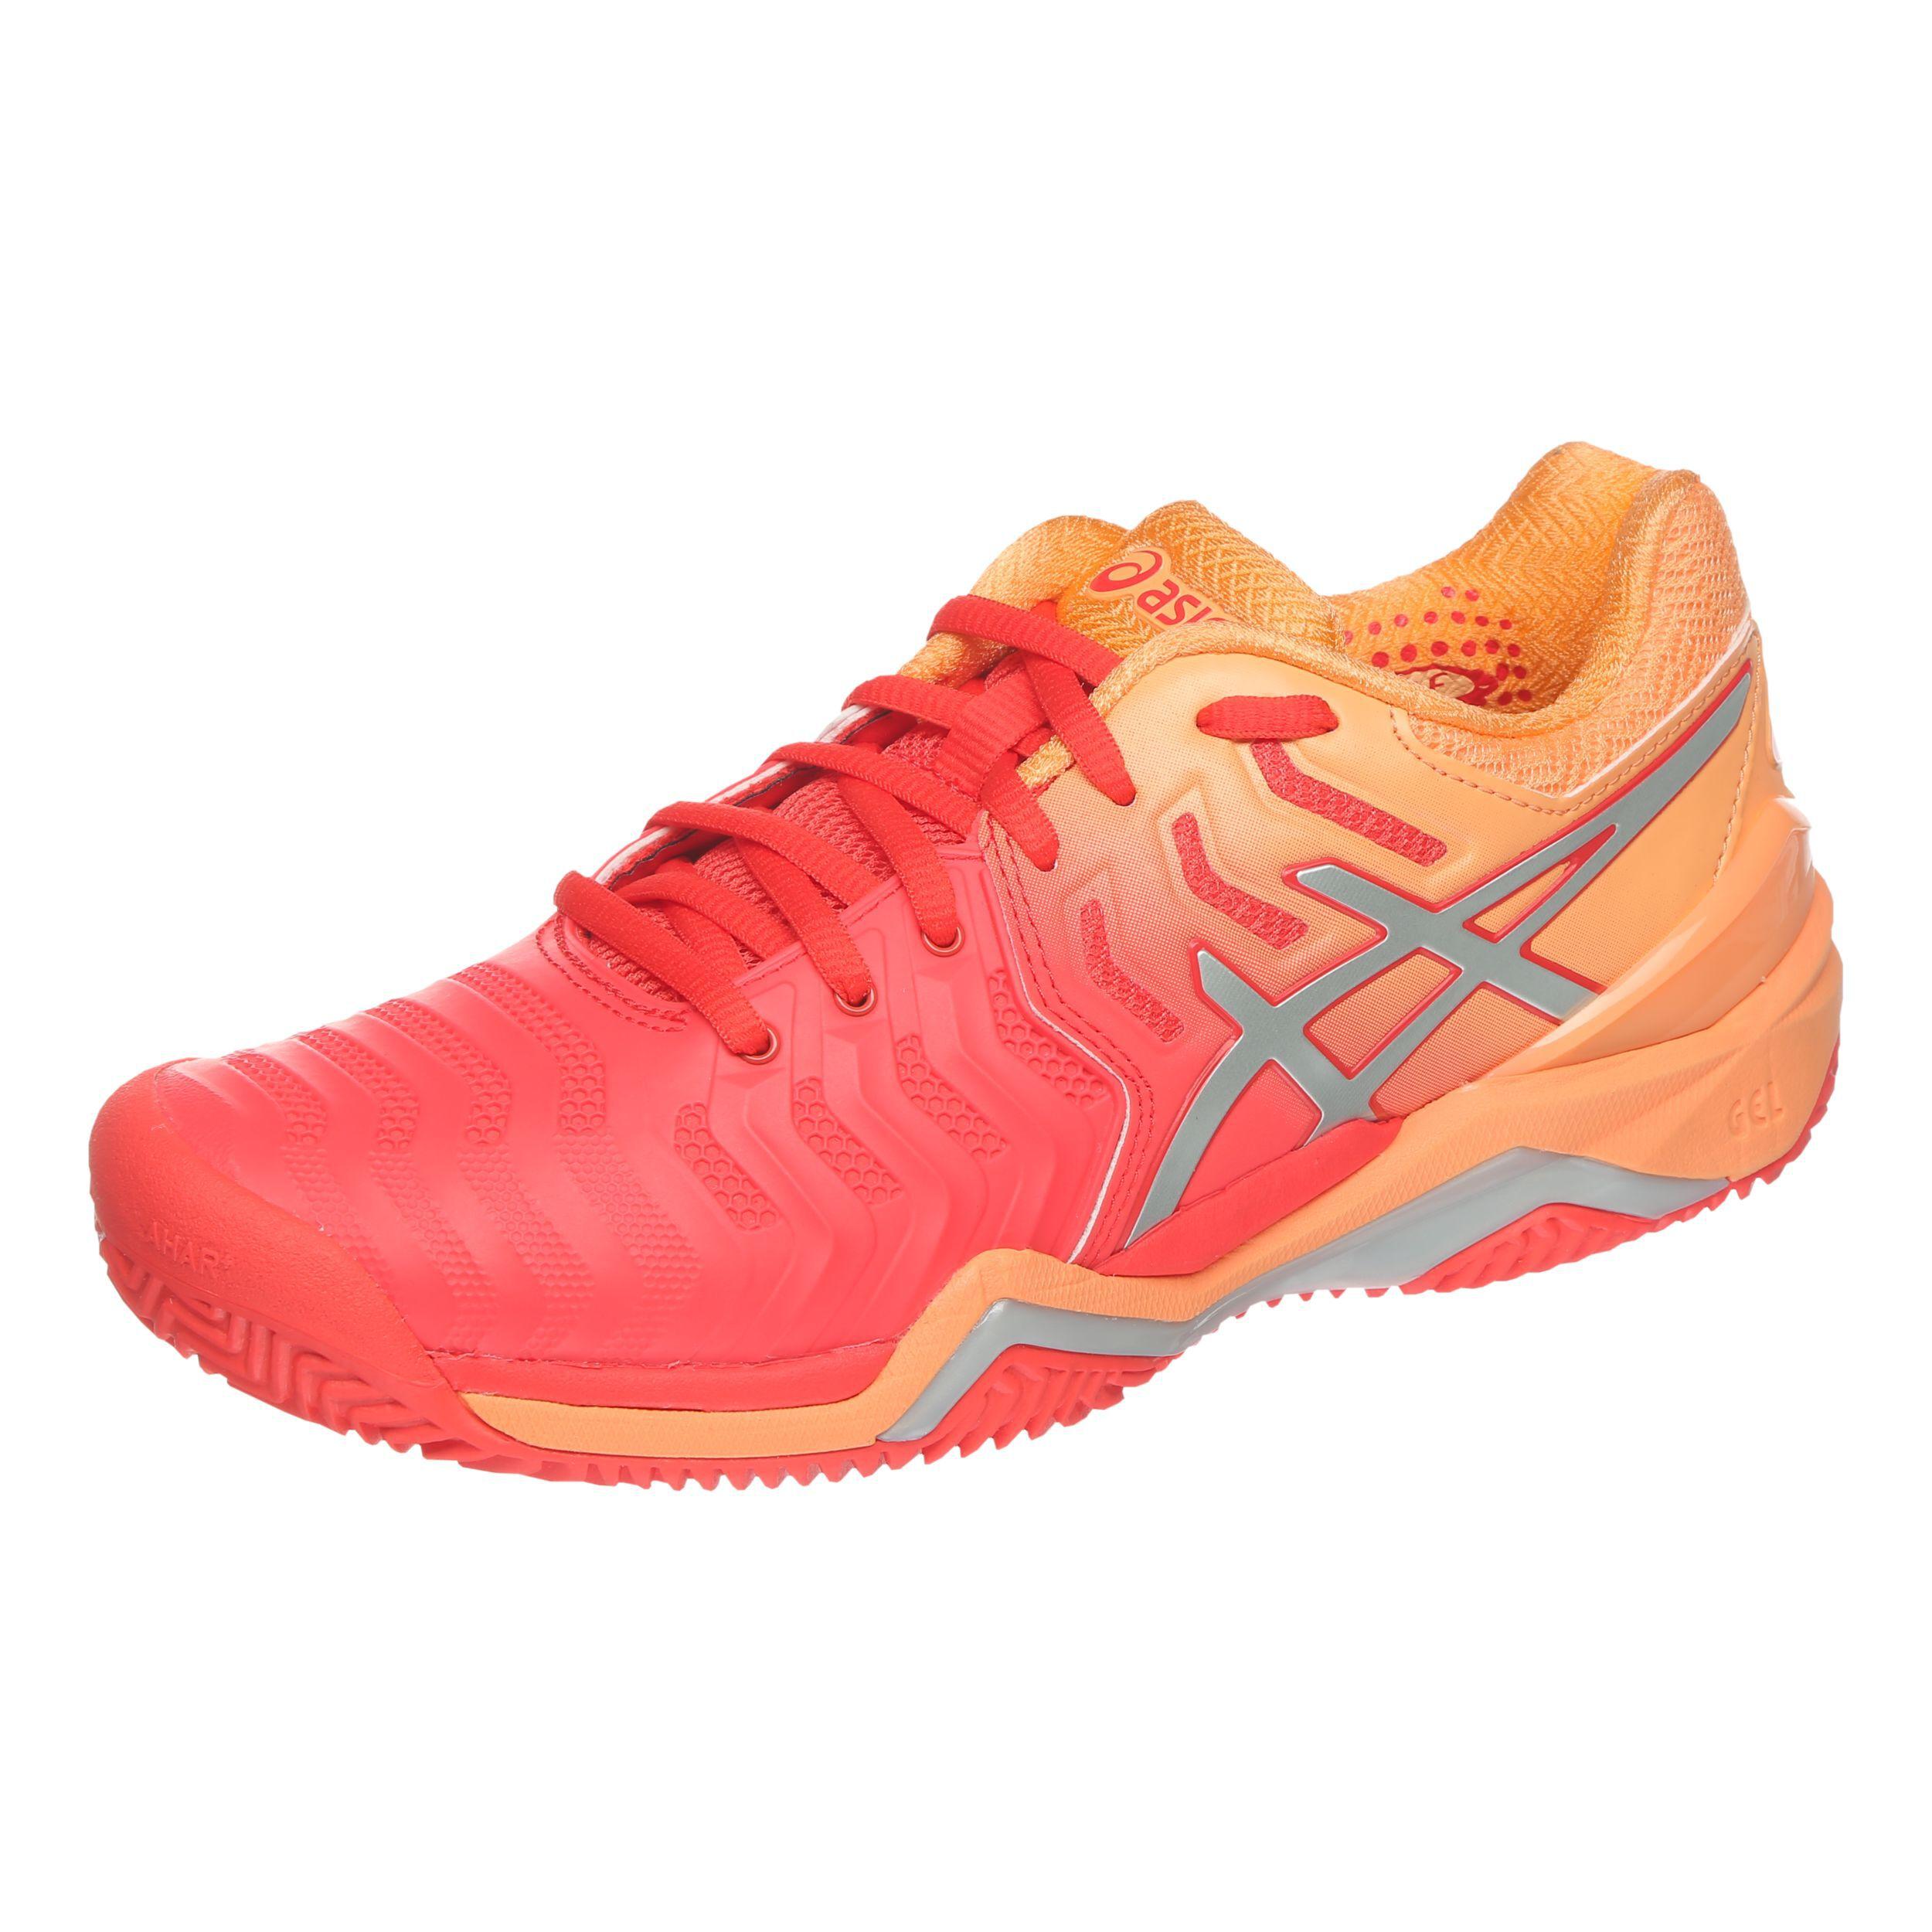 Asics Gel Resolution 7 Clay Chaussure Terre Battue Femmes